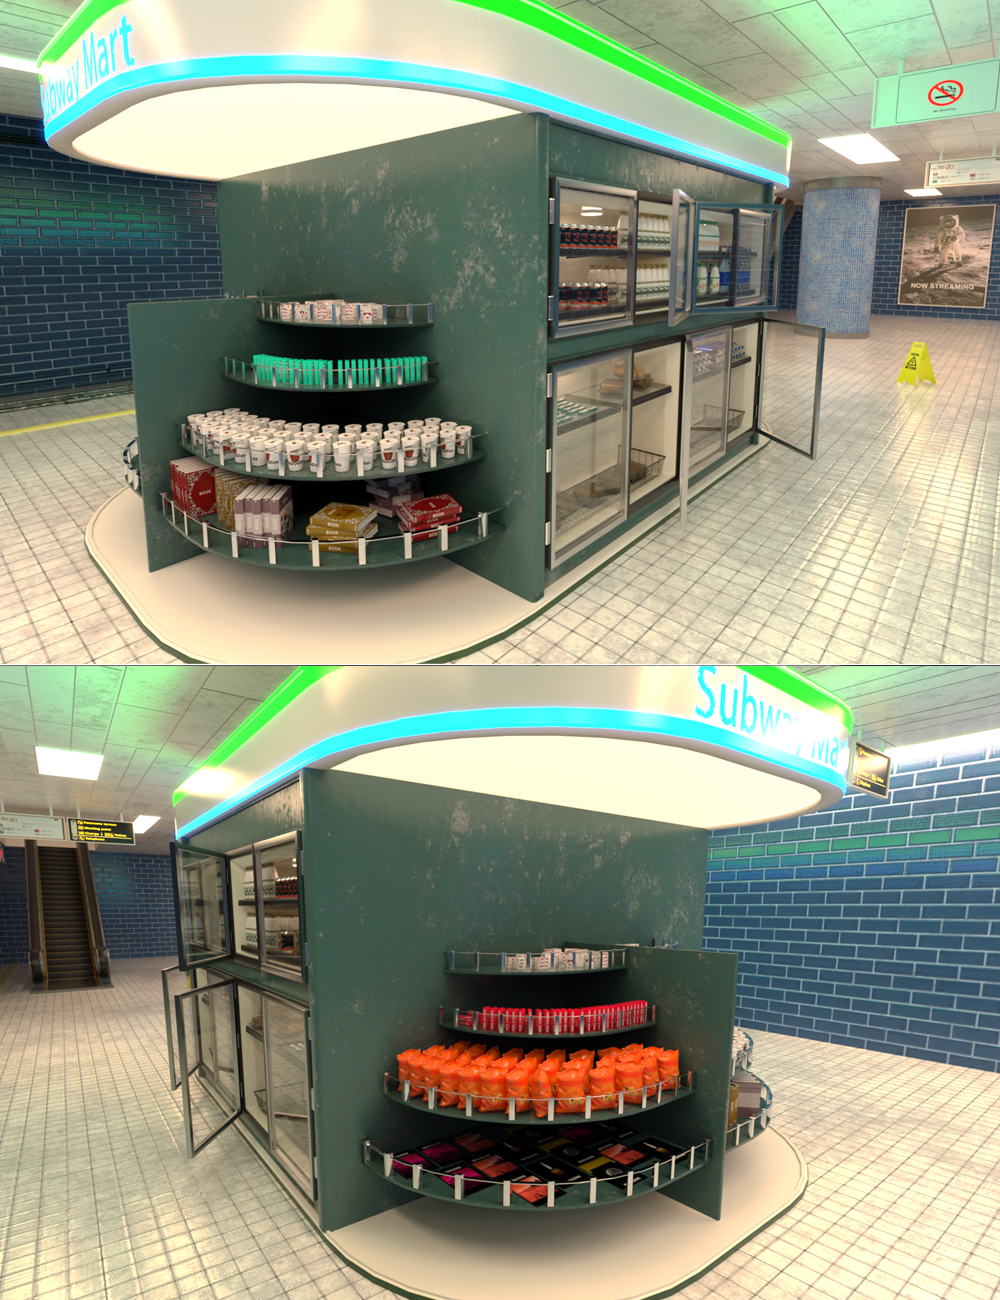 Subway Mart by: Tesla3dCorp, 3D Models by Daz 3D